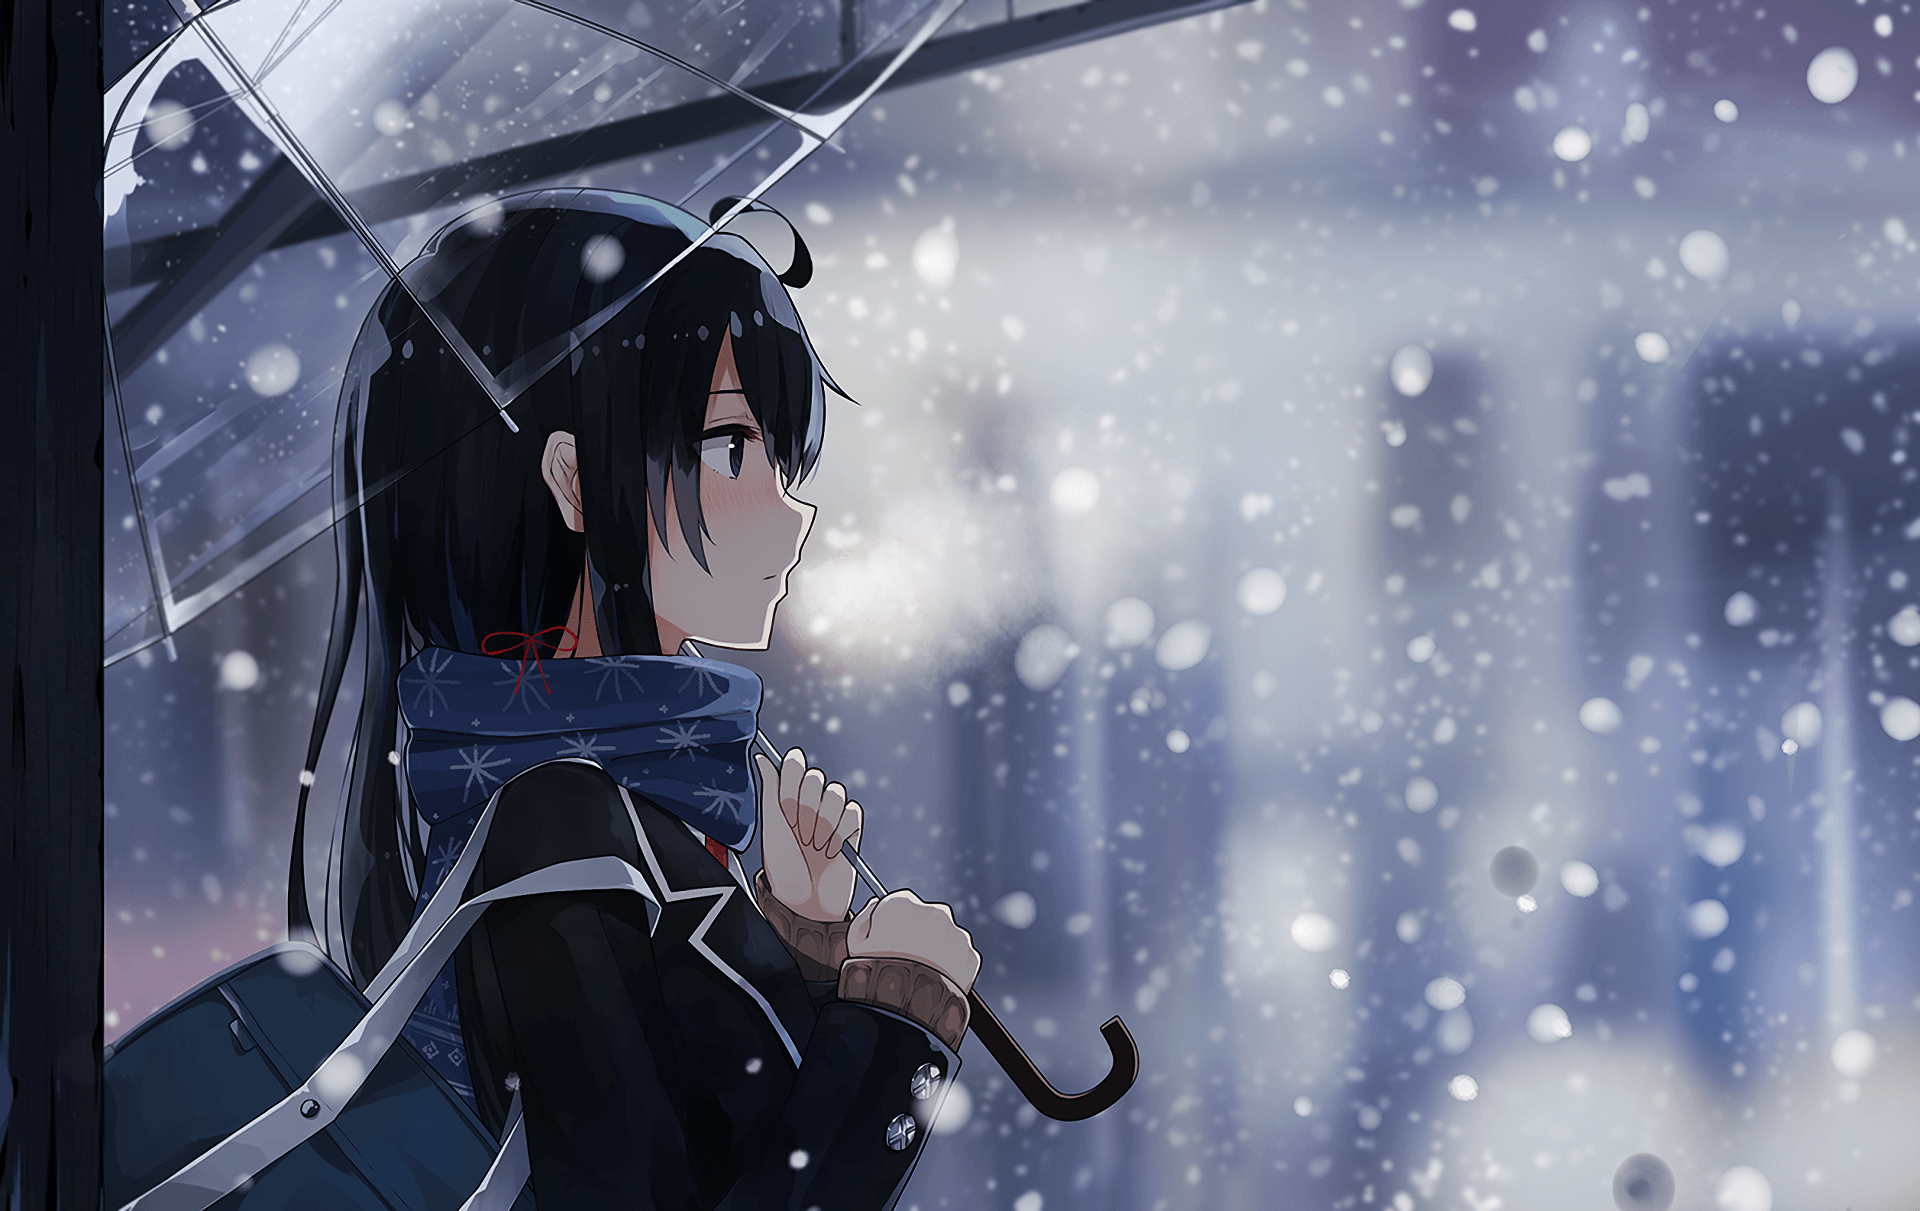 Unduh 61 Wallpaper Anime Hd Romantis Gratis Terbaru